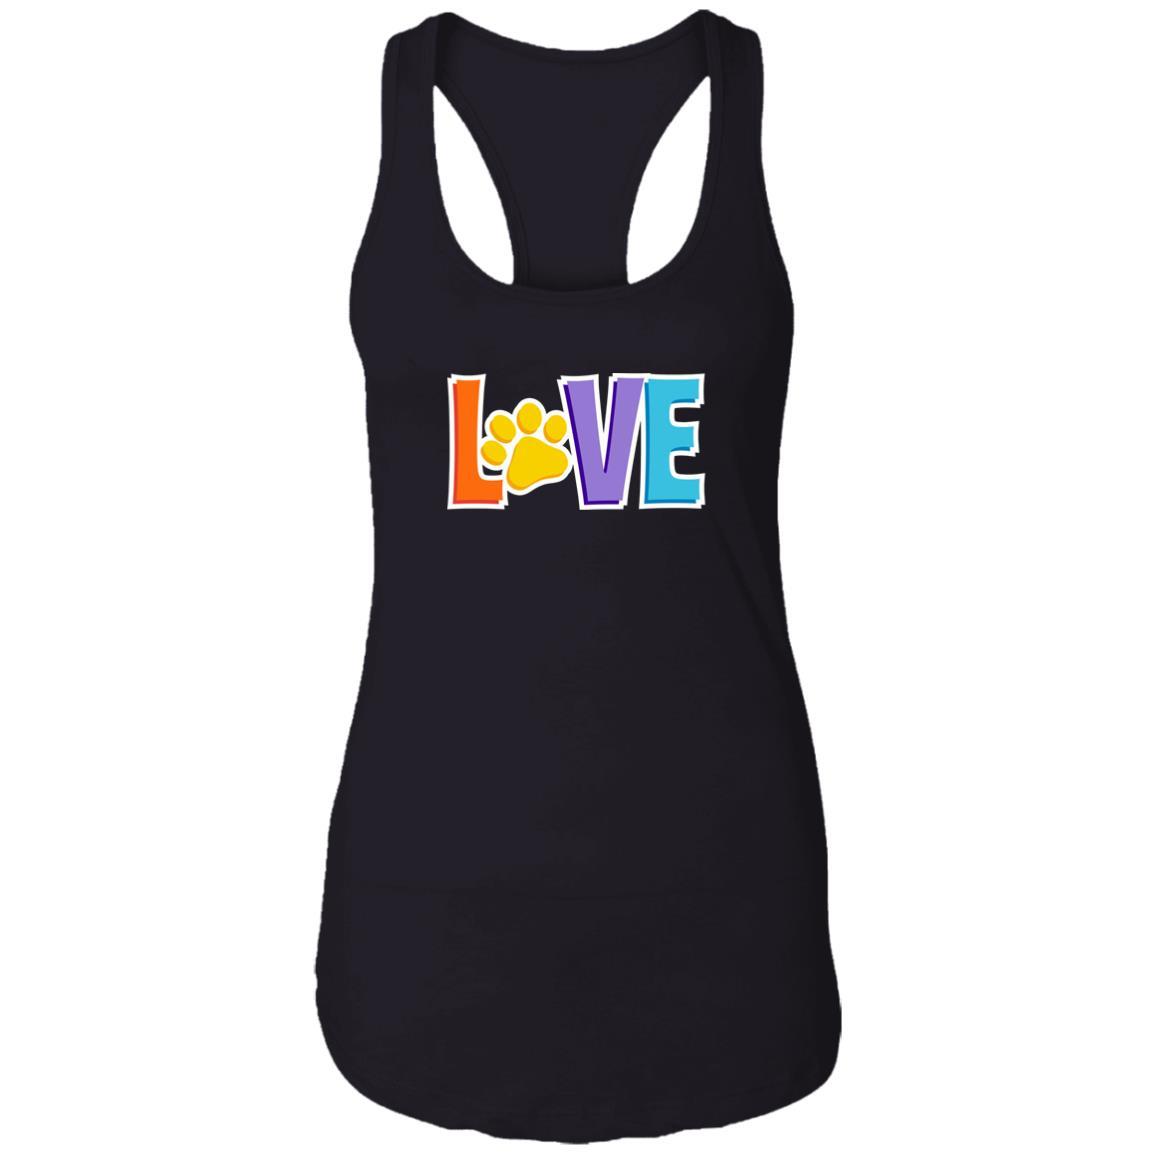 Love Is 💕 Ideal Tank- Black